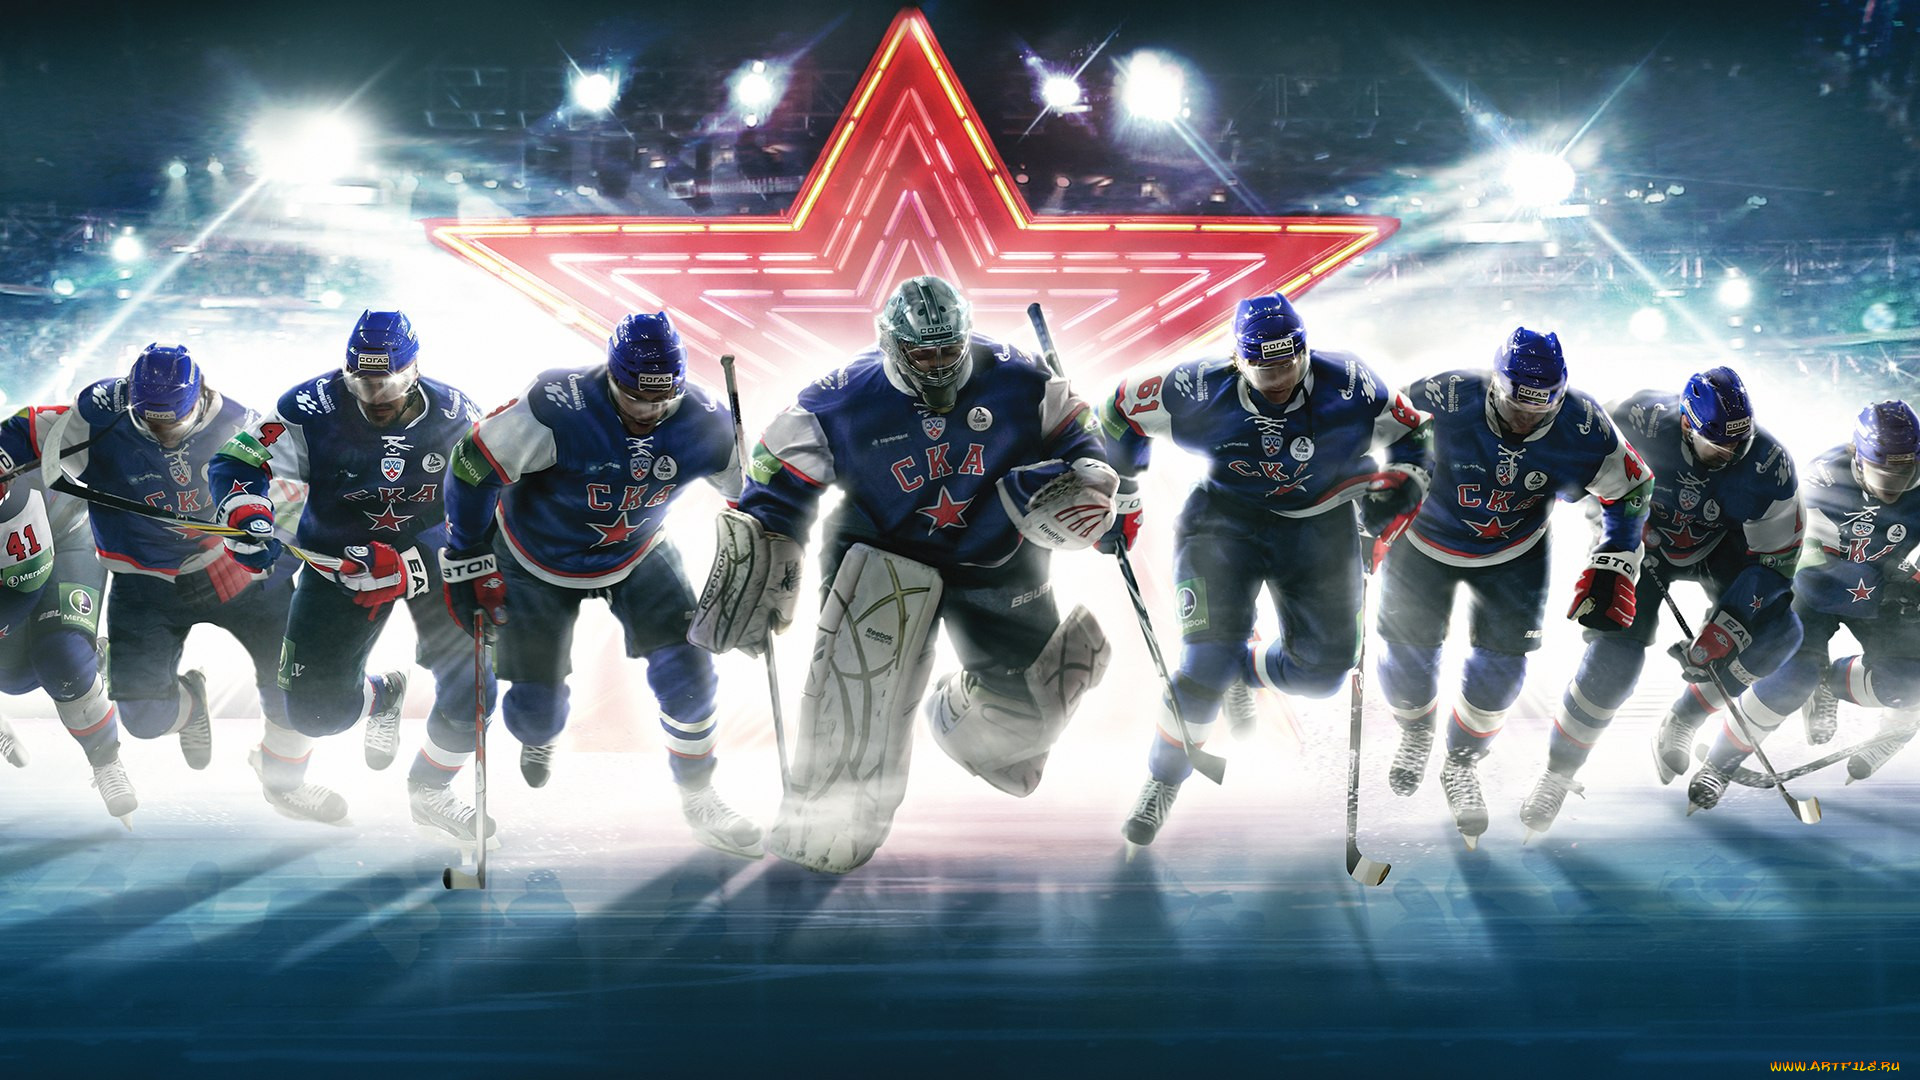 Крутые фото про хоккей